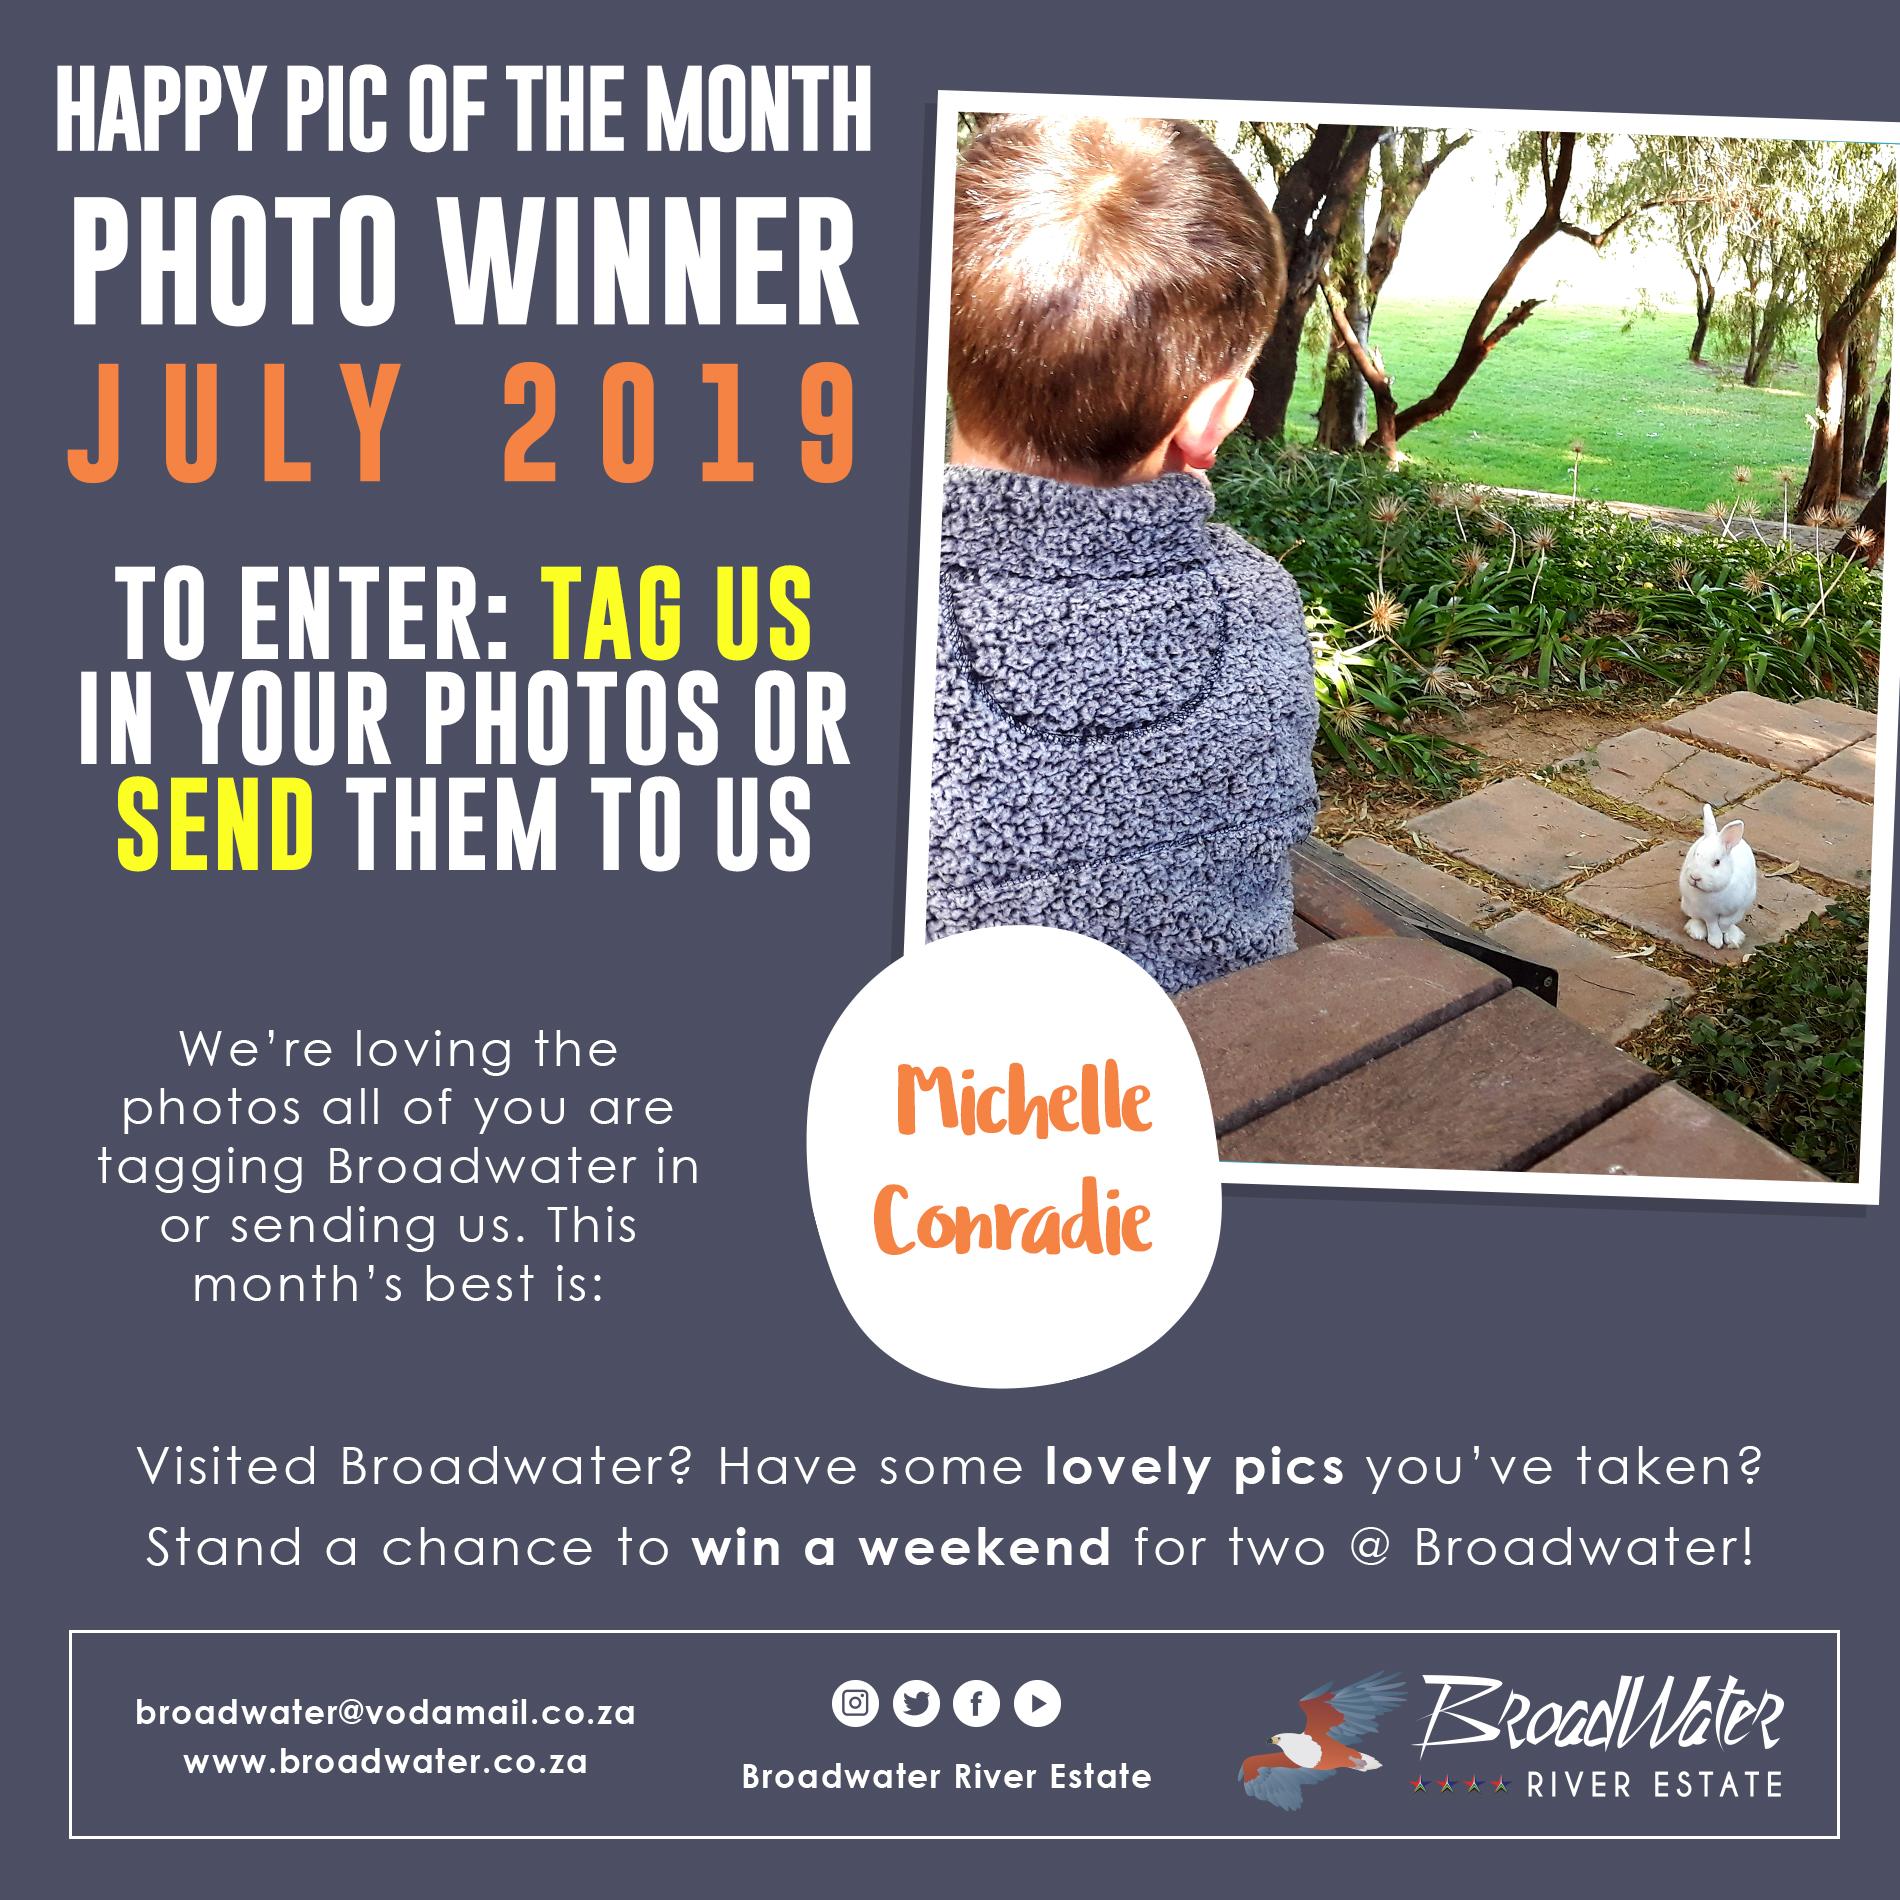 happy photo winner for july